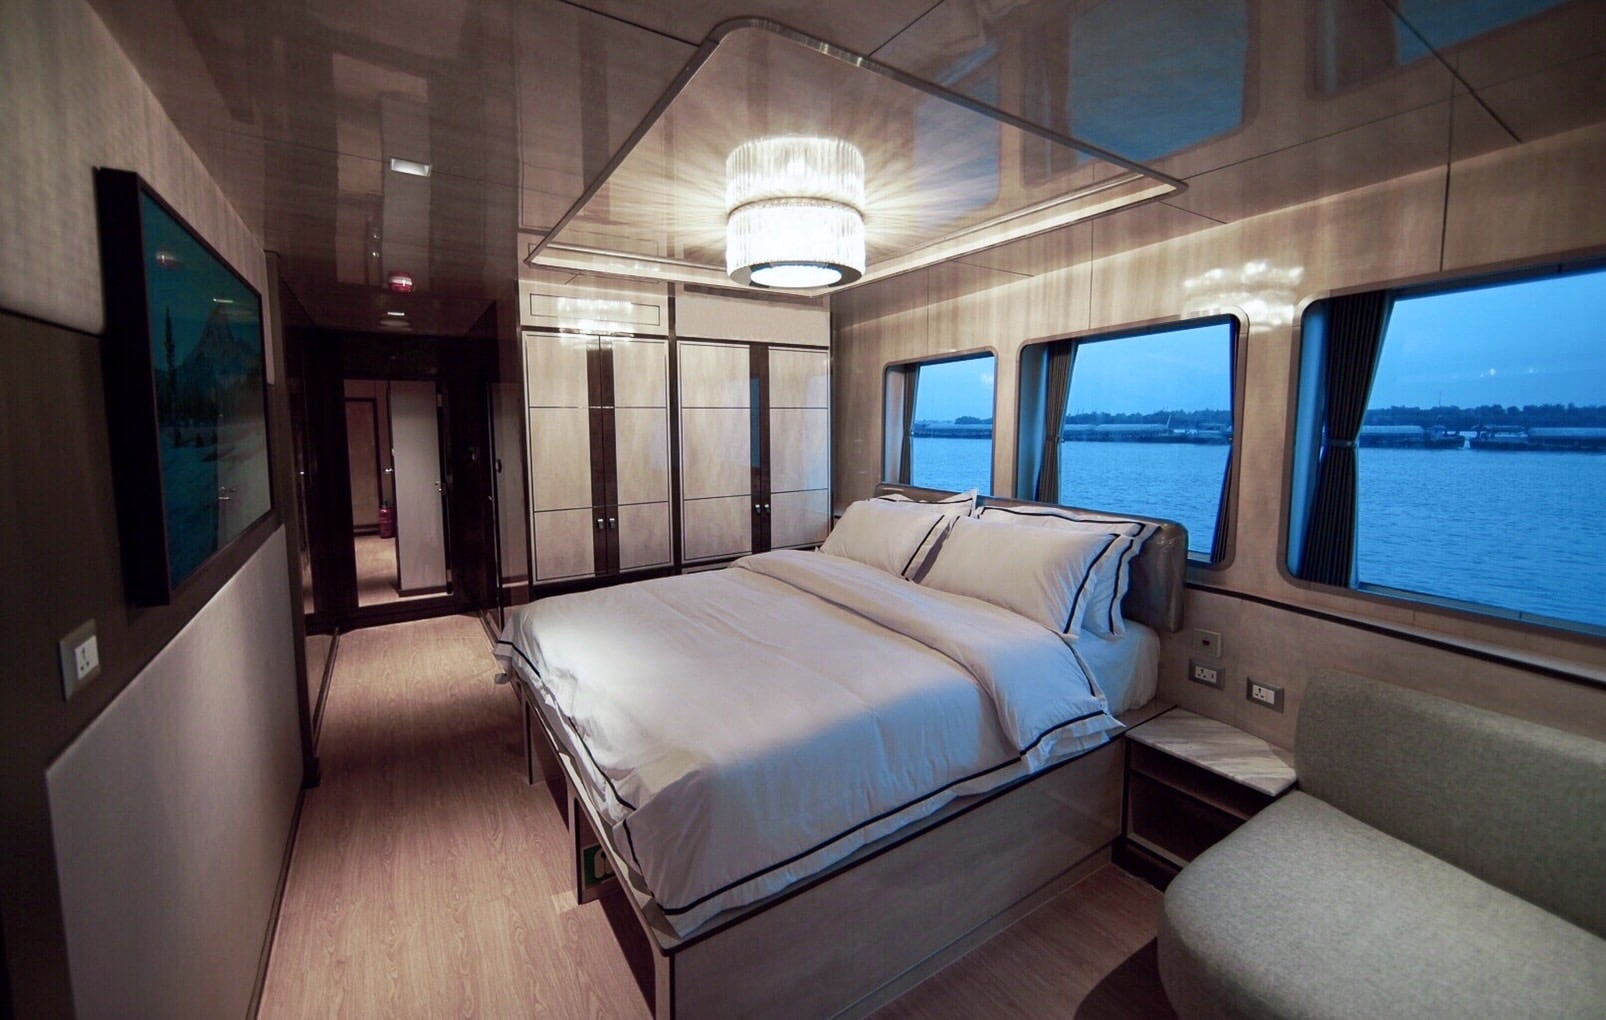 Platinum suite aboard luxury dive liveaboard All Star Velocean - Indonesia dive liveaboard